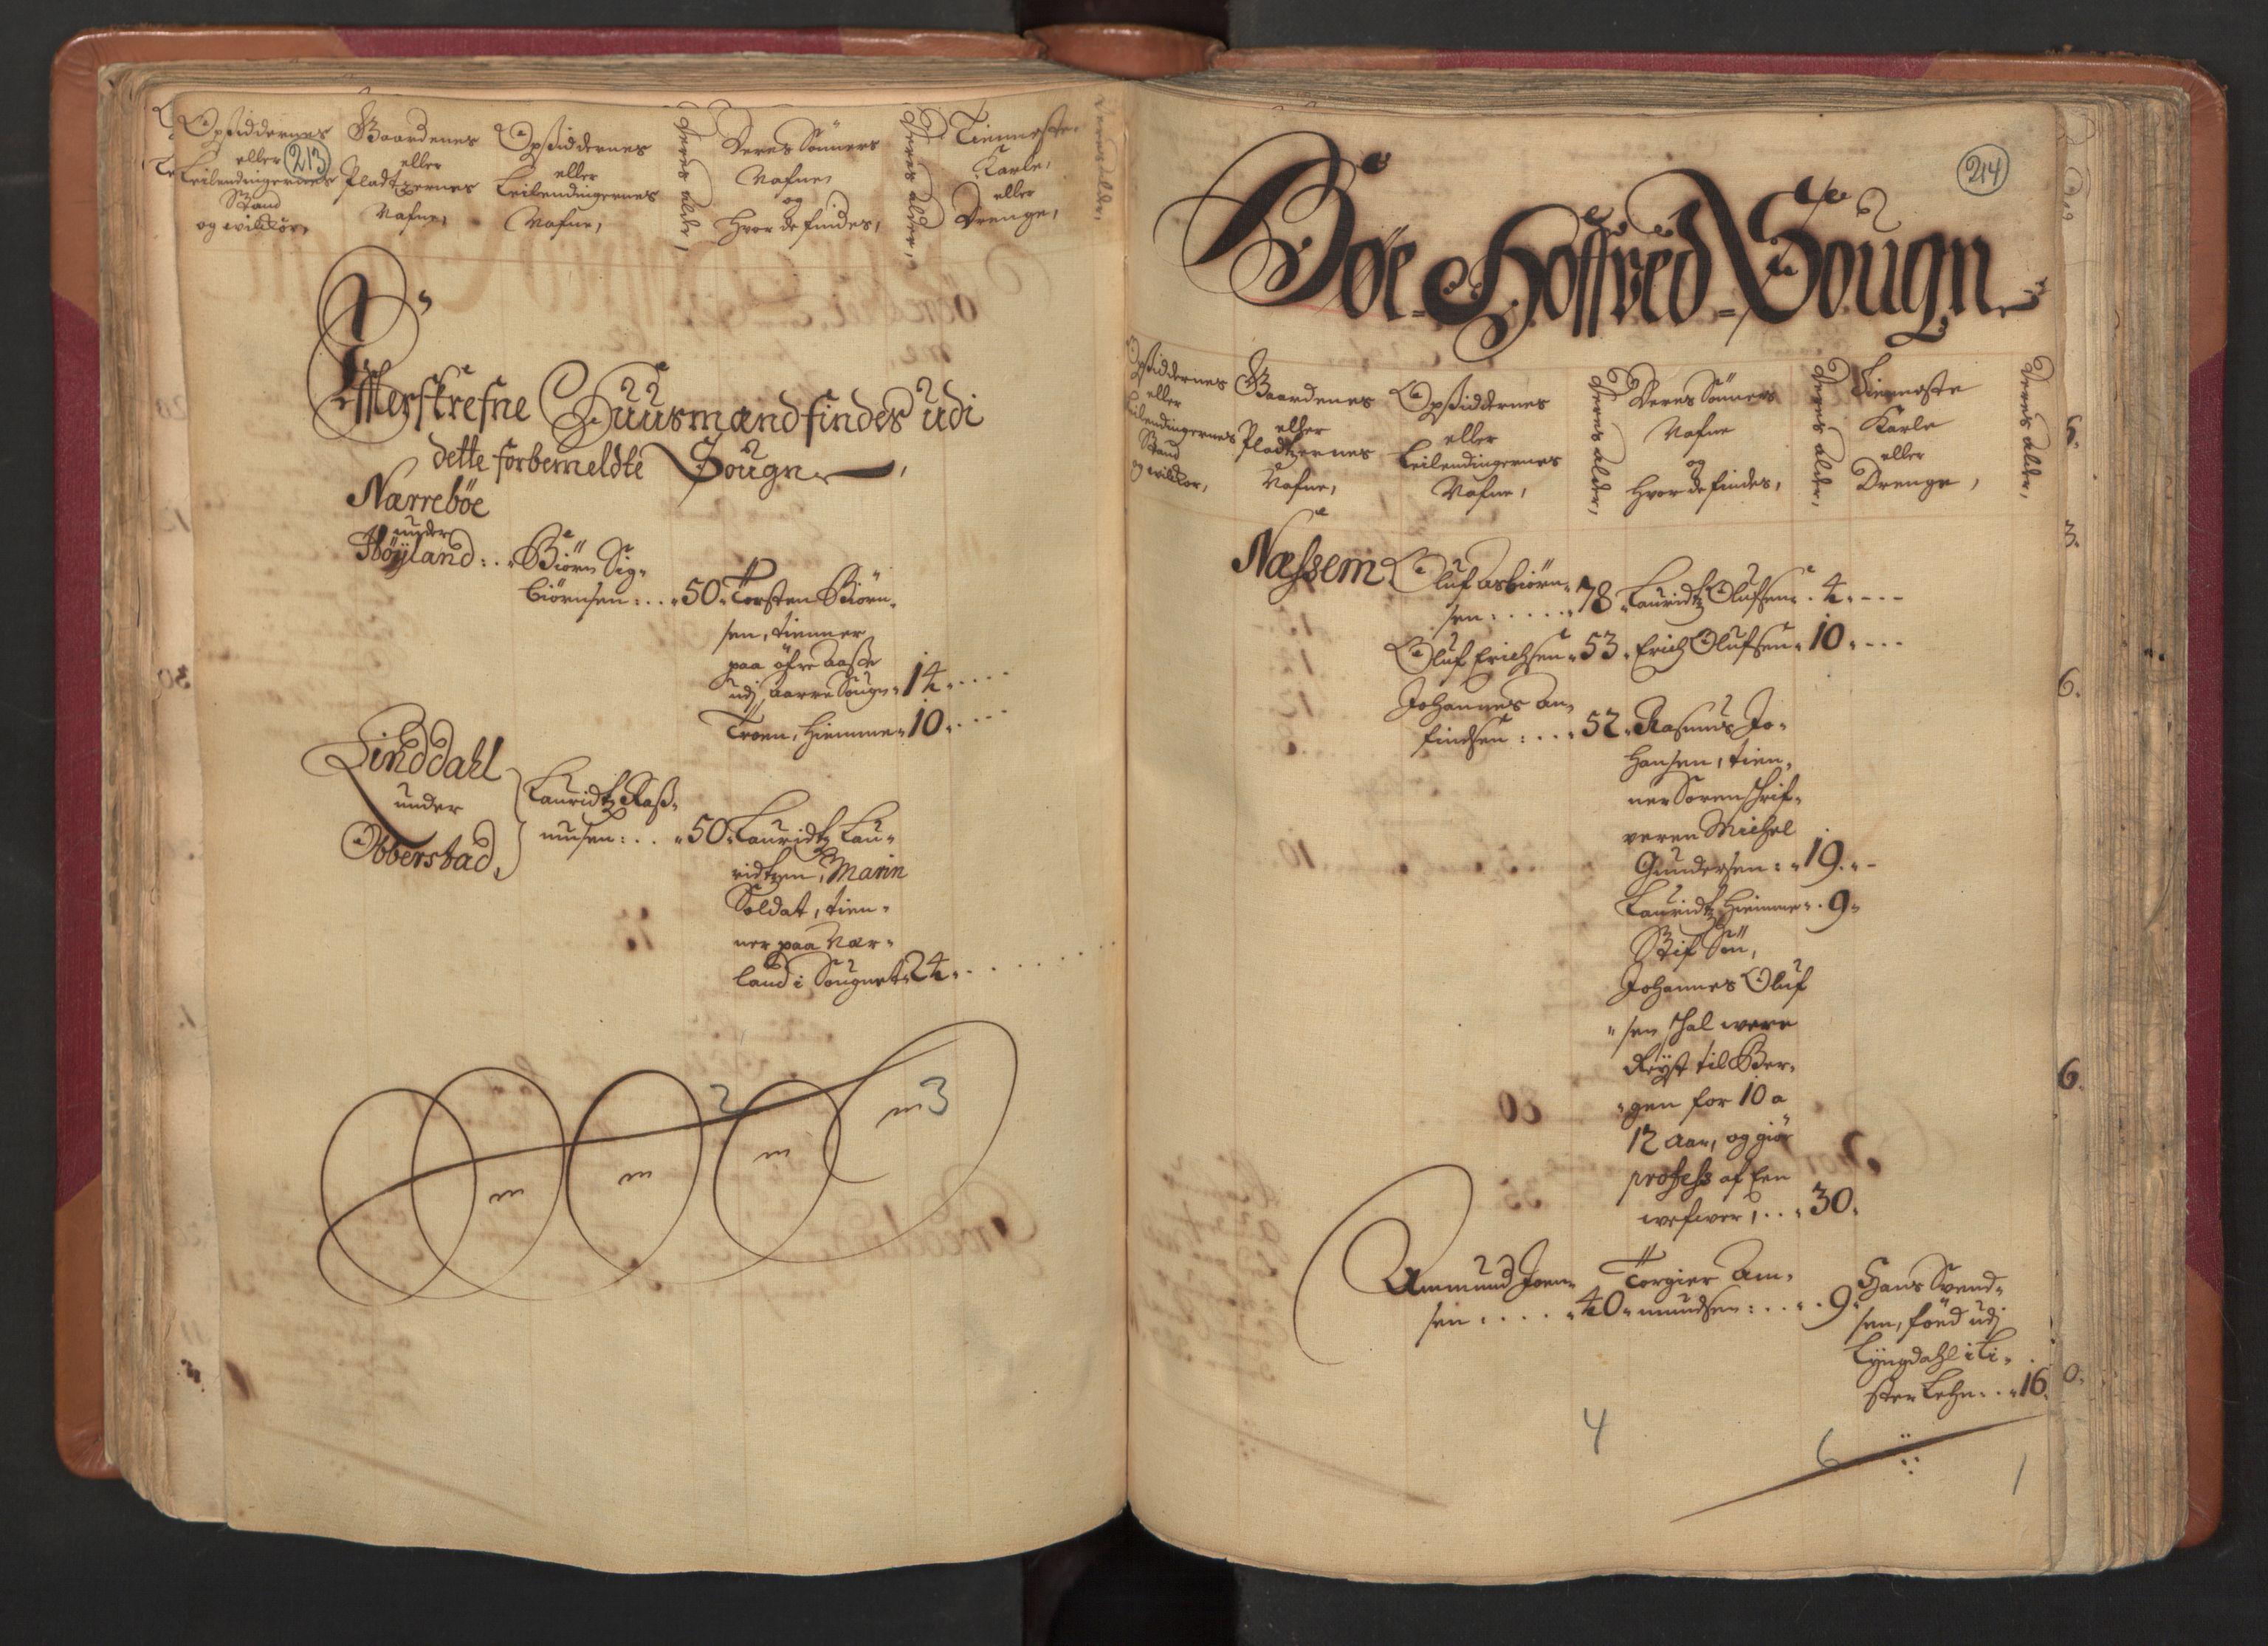 RA, Manntallet 1701, nr. 4: Jæren og Dalane fogderi, 1701, s. 213-214